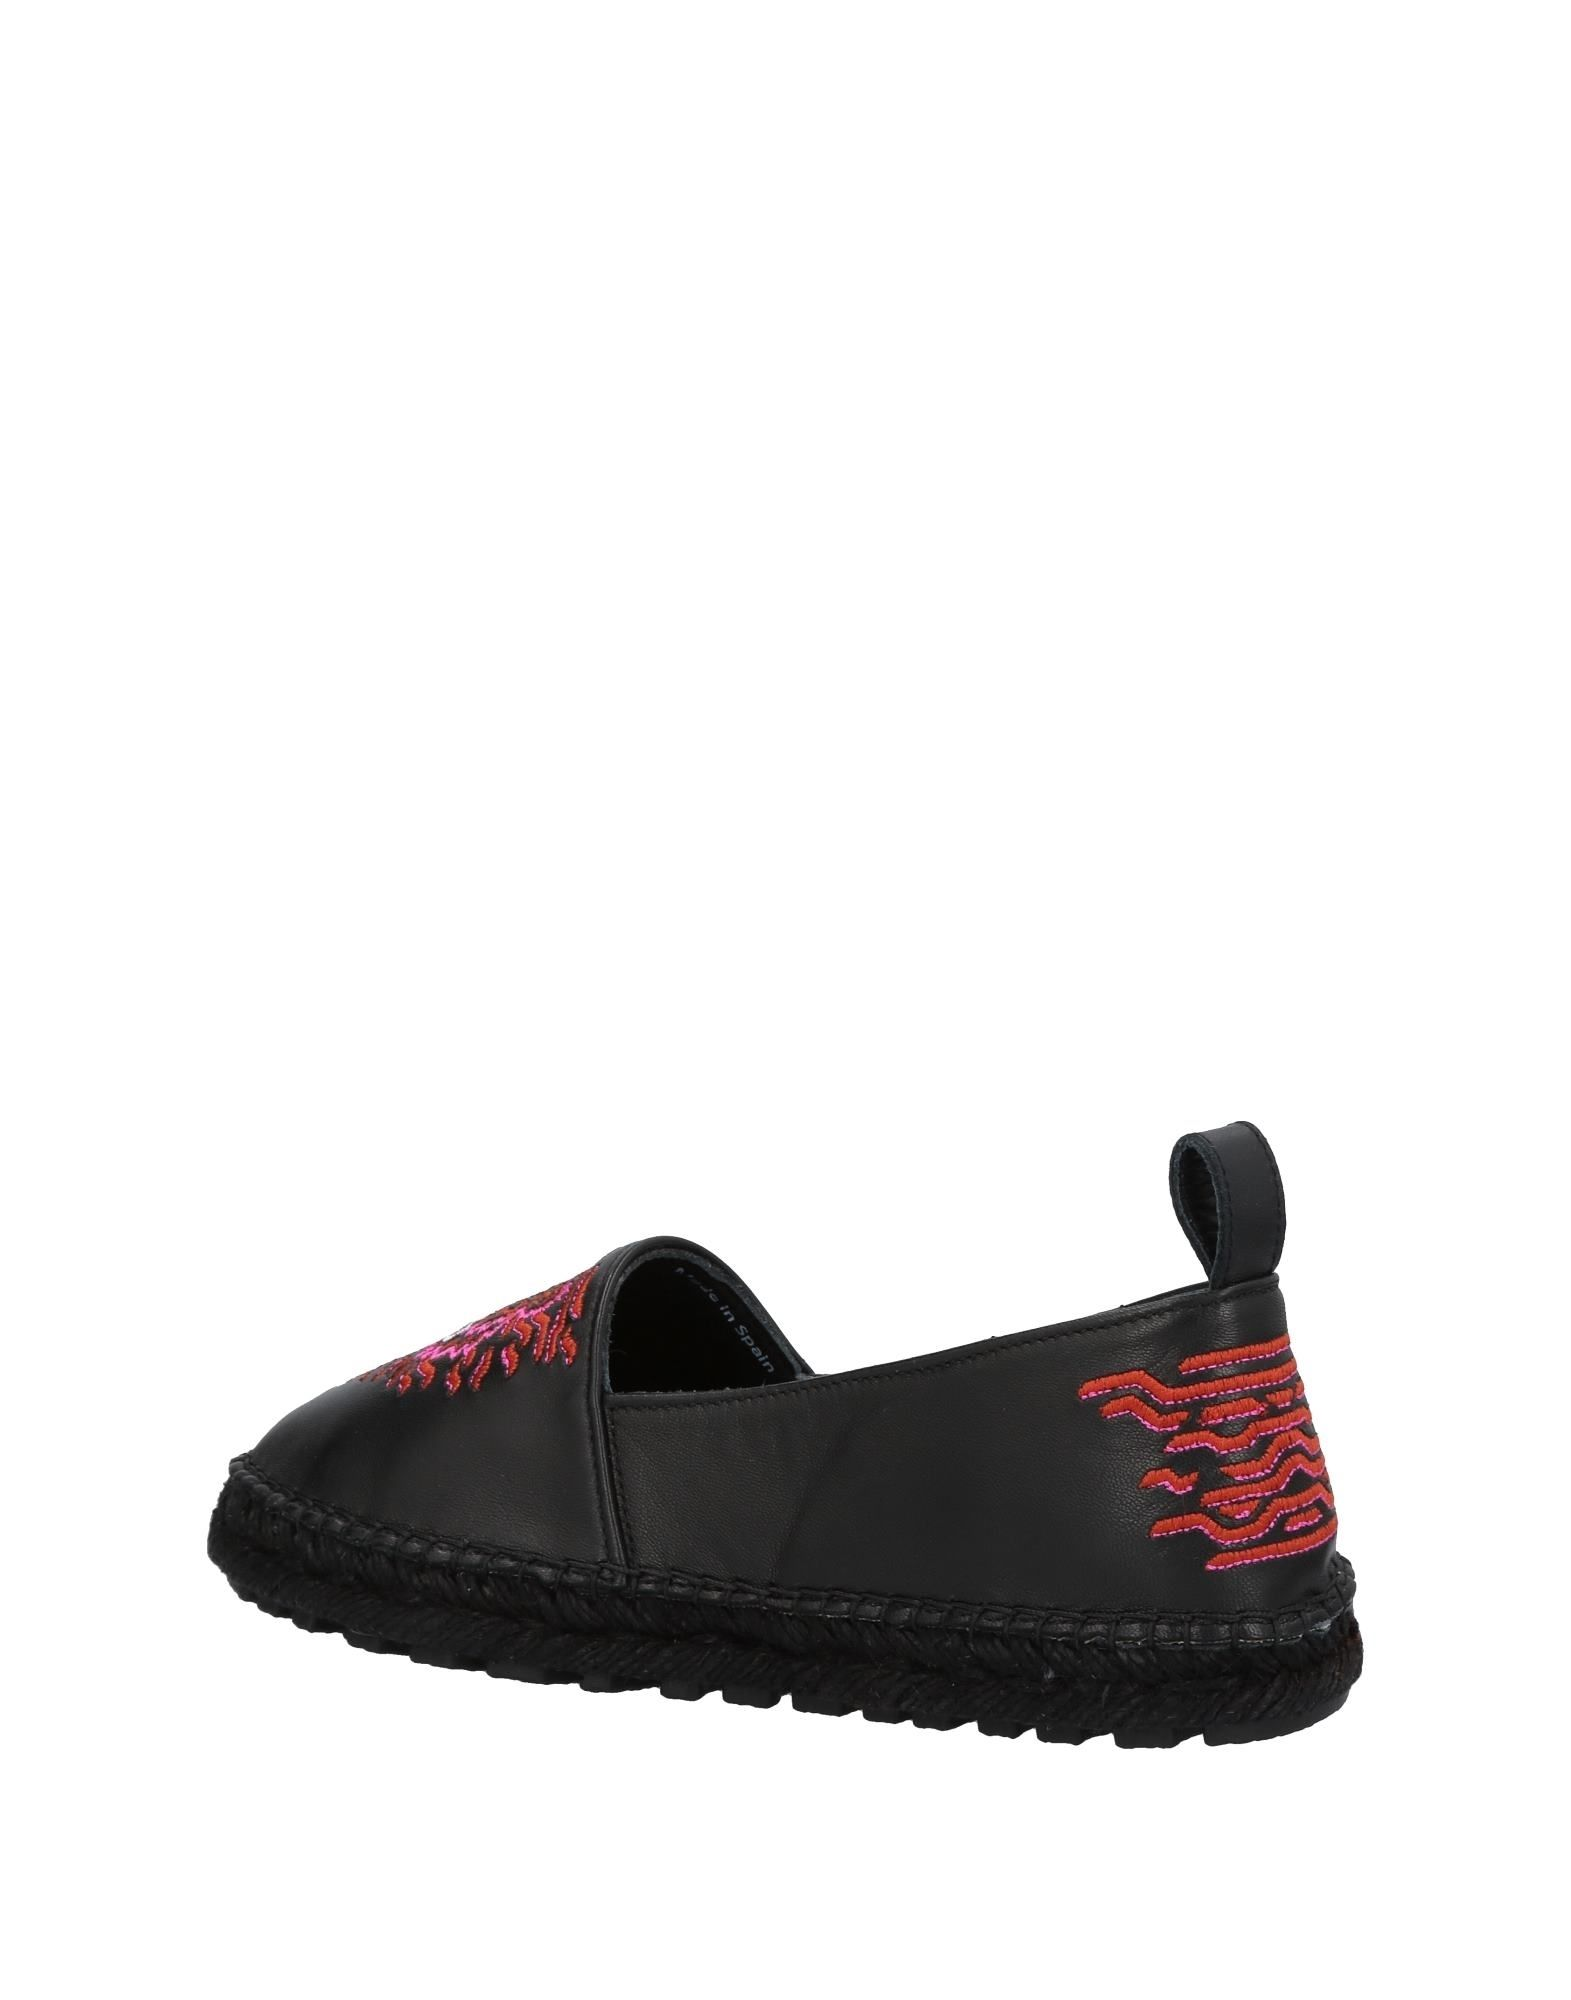 Stilvolle billige Schuhe Kenzo Espadrilles 11459838VN Damen  11459838VN Espadrilles a6fcb3